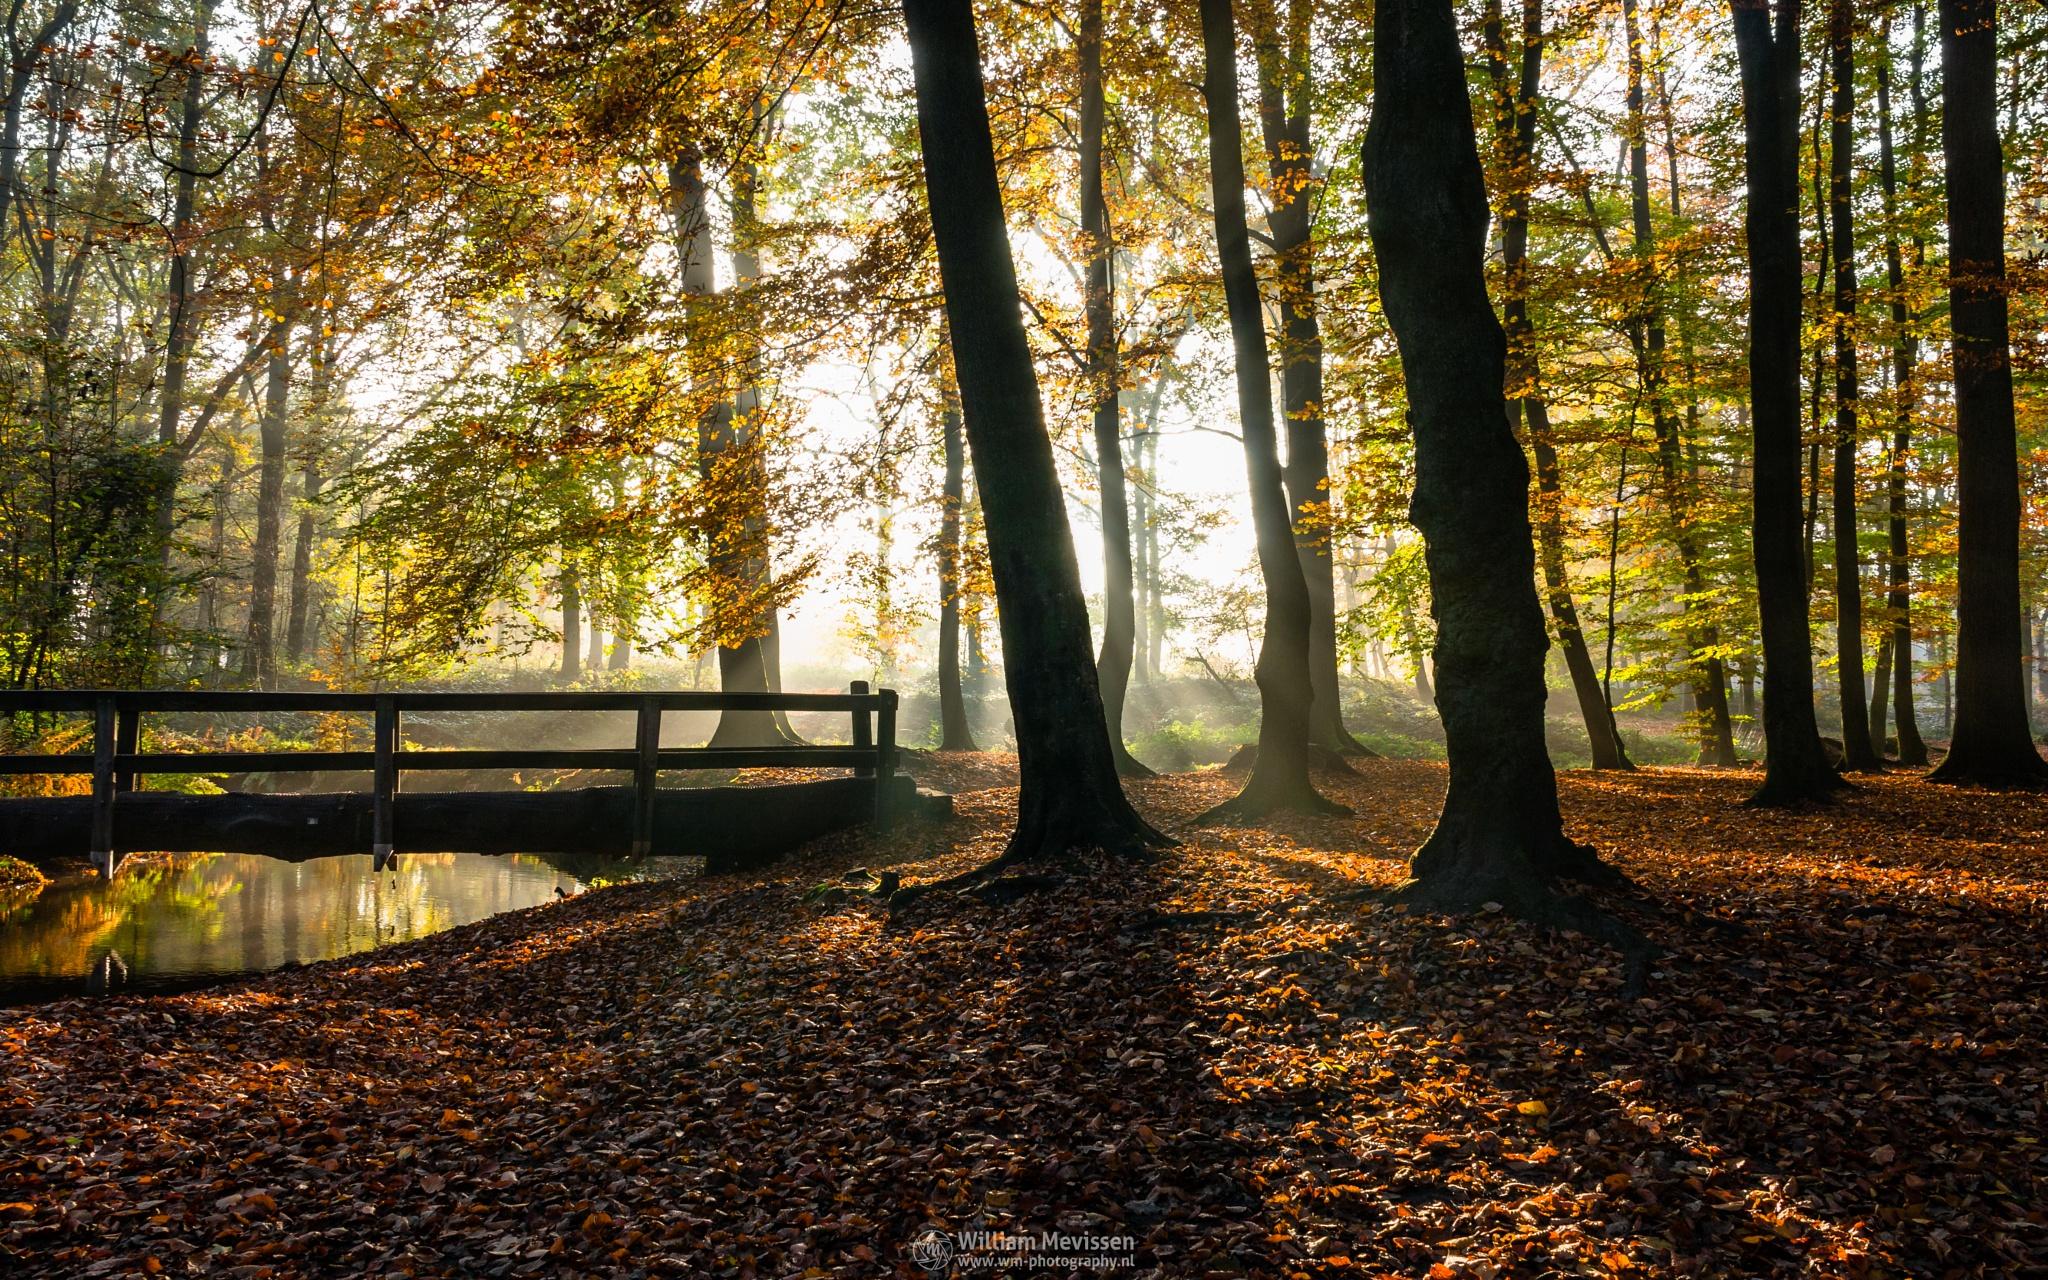 Photo in Nature #geijsteren #venray #oostrum #estate #landgoed #weichs de wenne #limburg #noord-limburg #nature #landgoed geijsteren #light #tree #trees #mist #misty #foggy #fog #foliage #nature reserve #forest #woods #leaves #geysteren #autumn #silhouettes #sunrise #bridge #trunk #oostrumse beek #brook